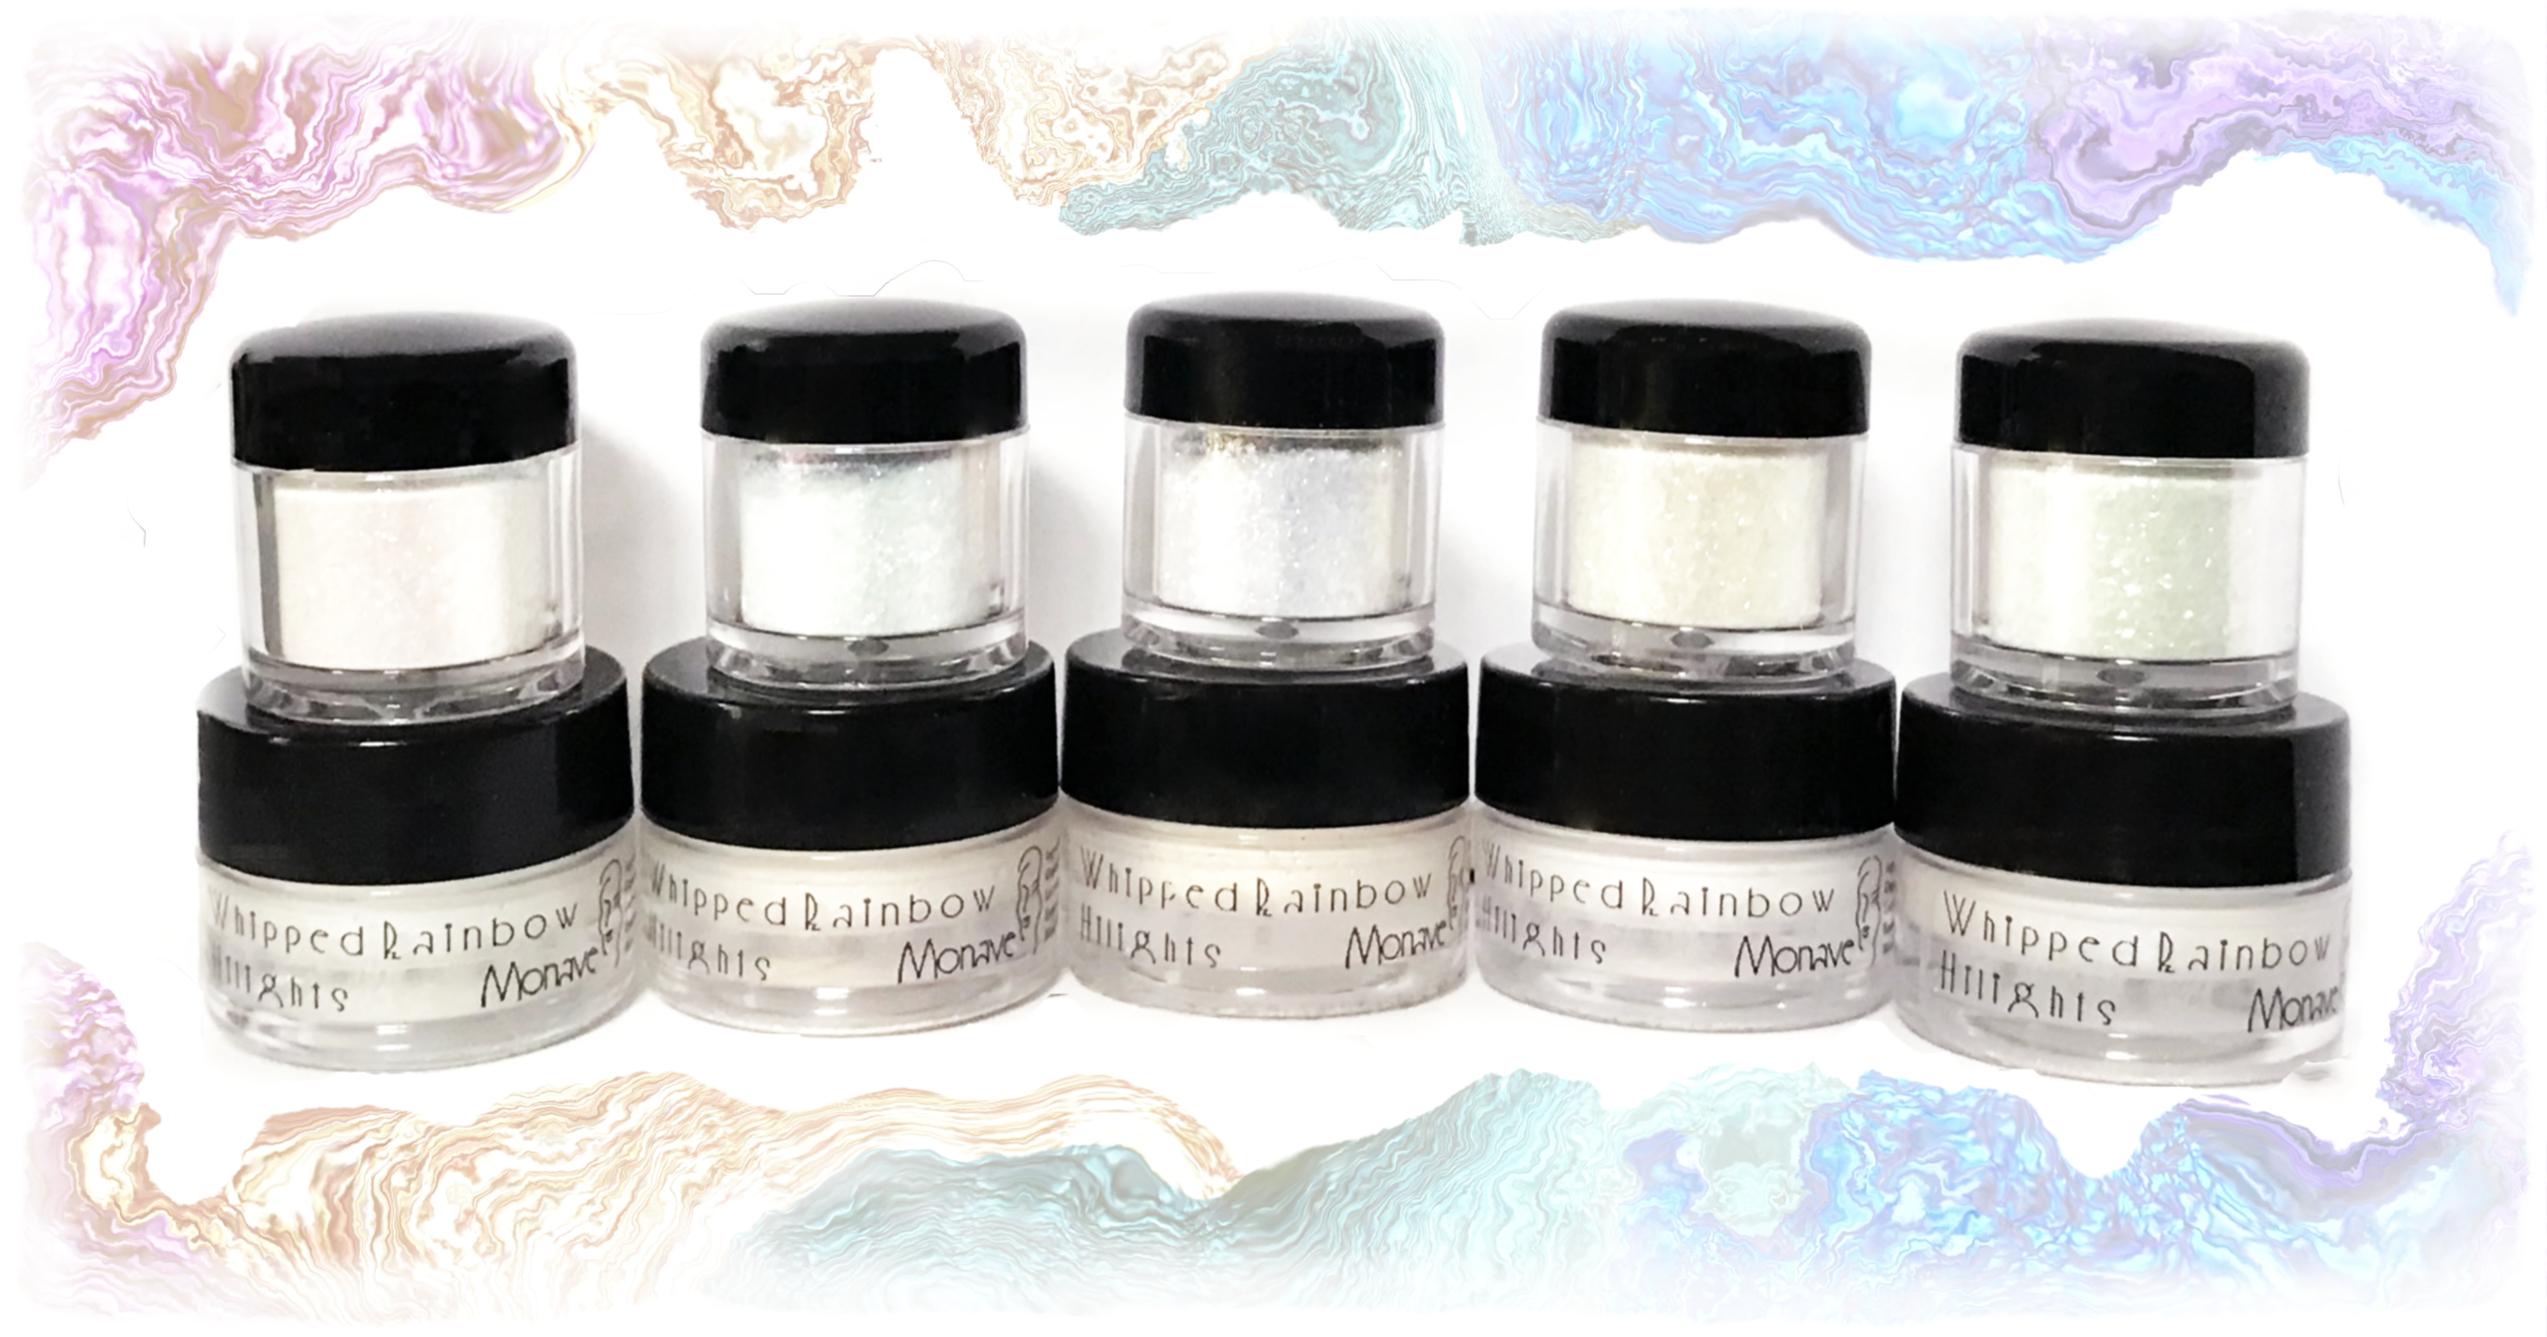 Mousse Rainbow Goddess Hilight & Sparkle Powder Duo Sets